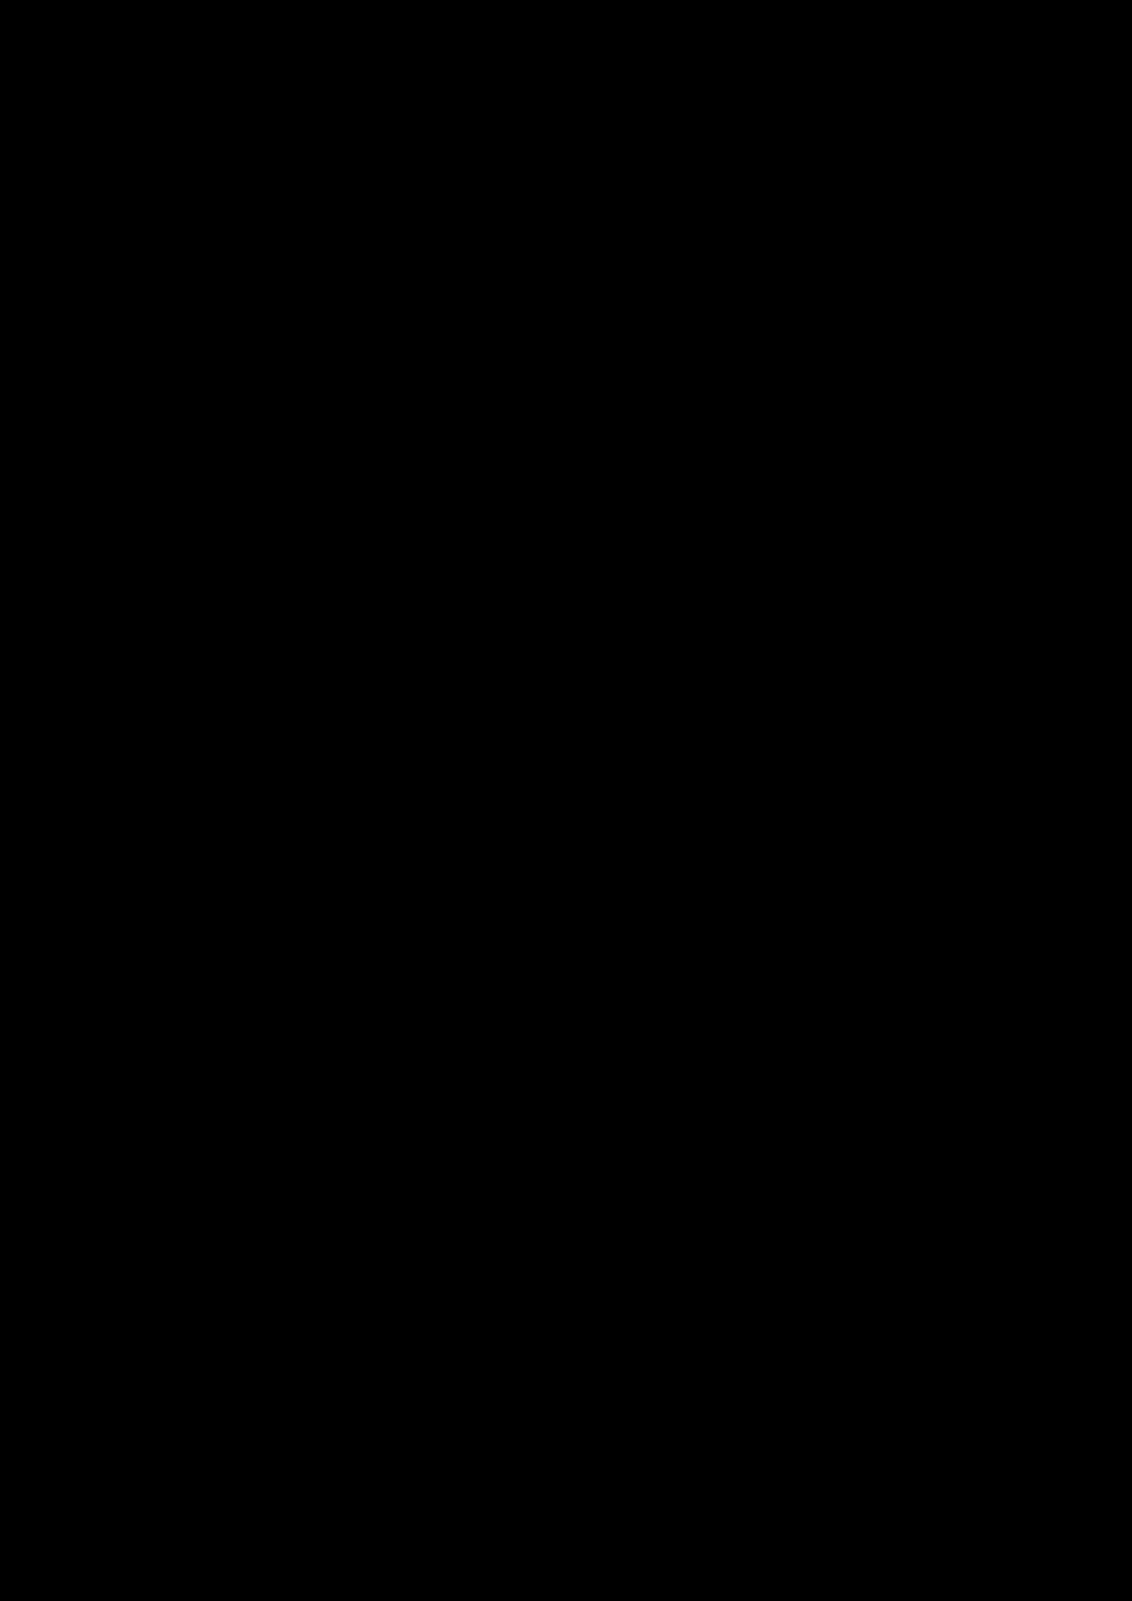 Korolevstvo slez slide, Image 49